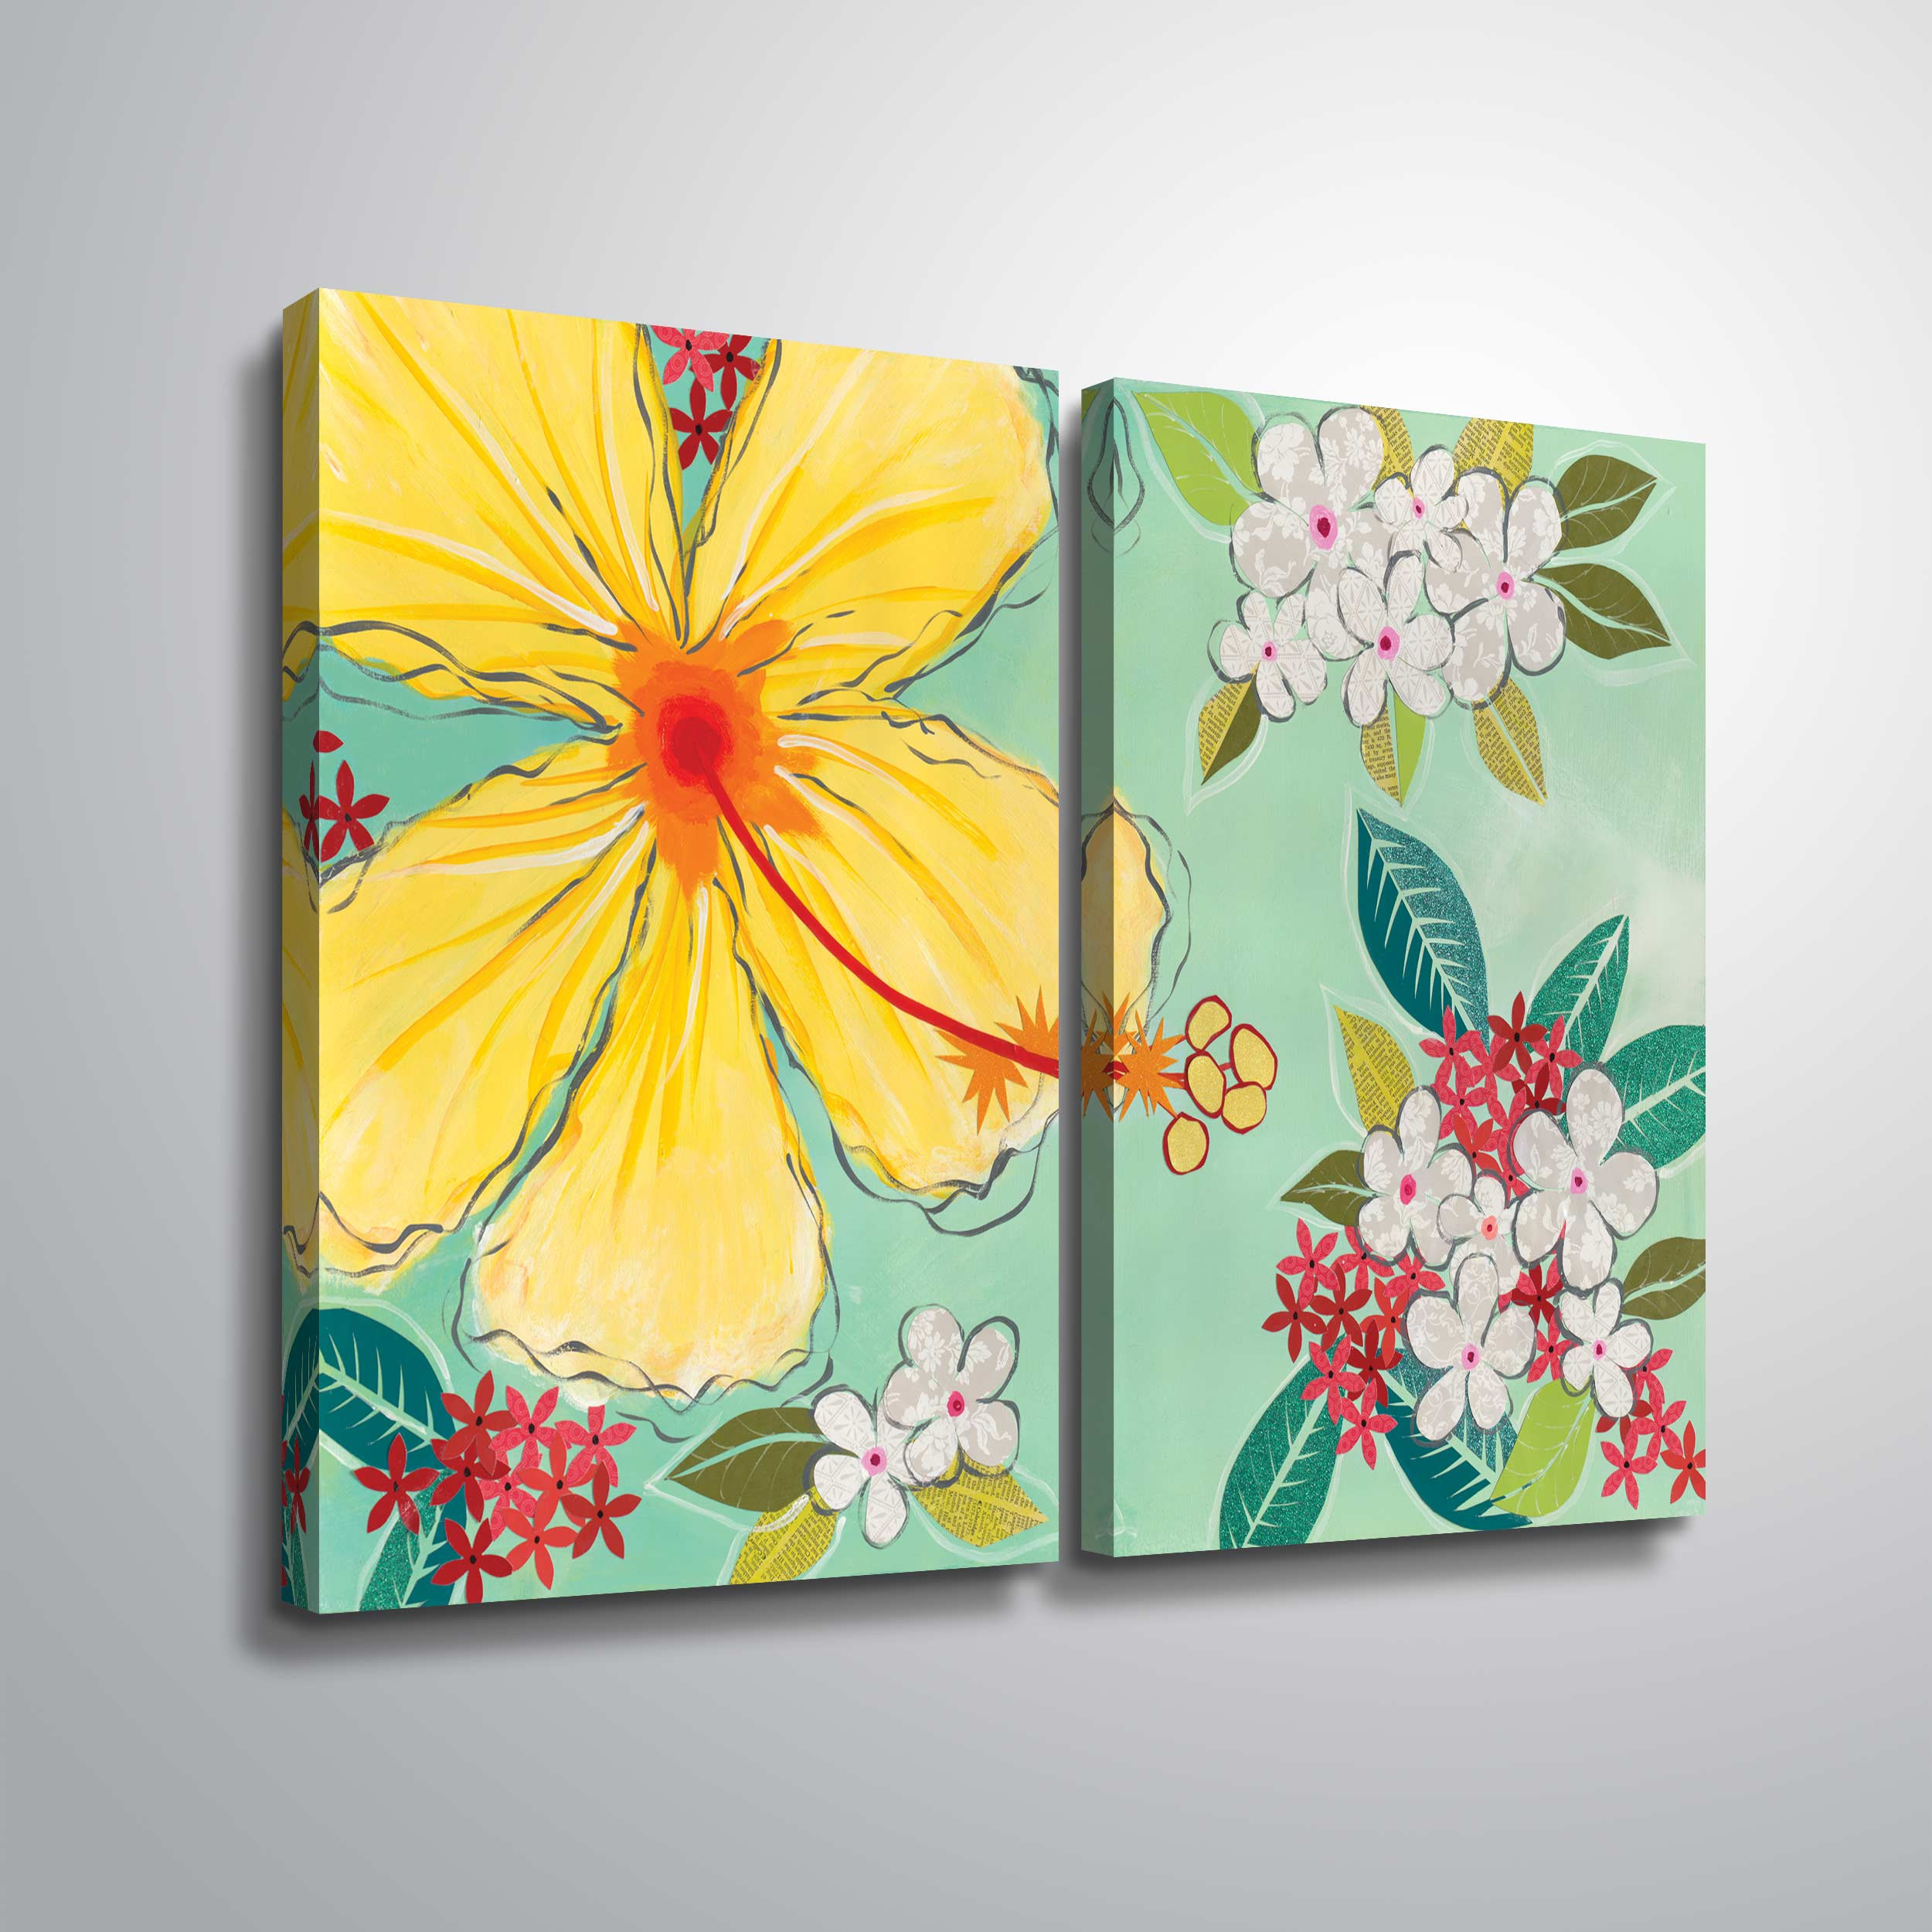 Artwall Tropical Flower 2 Piece Gallery Wrapped Canvas Set By Jennifer Peck Walmart Com Walmart Com